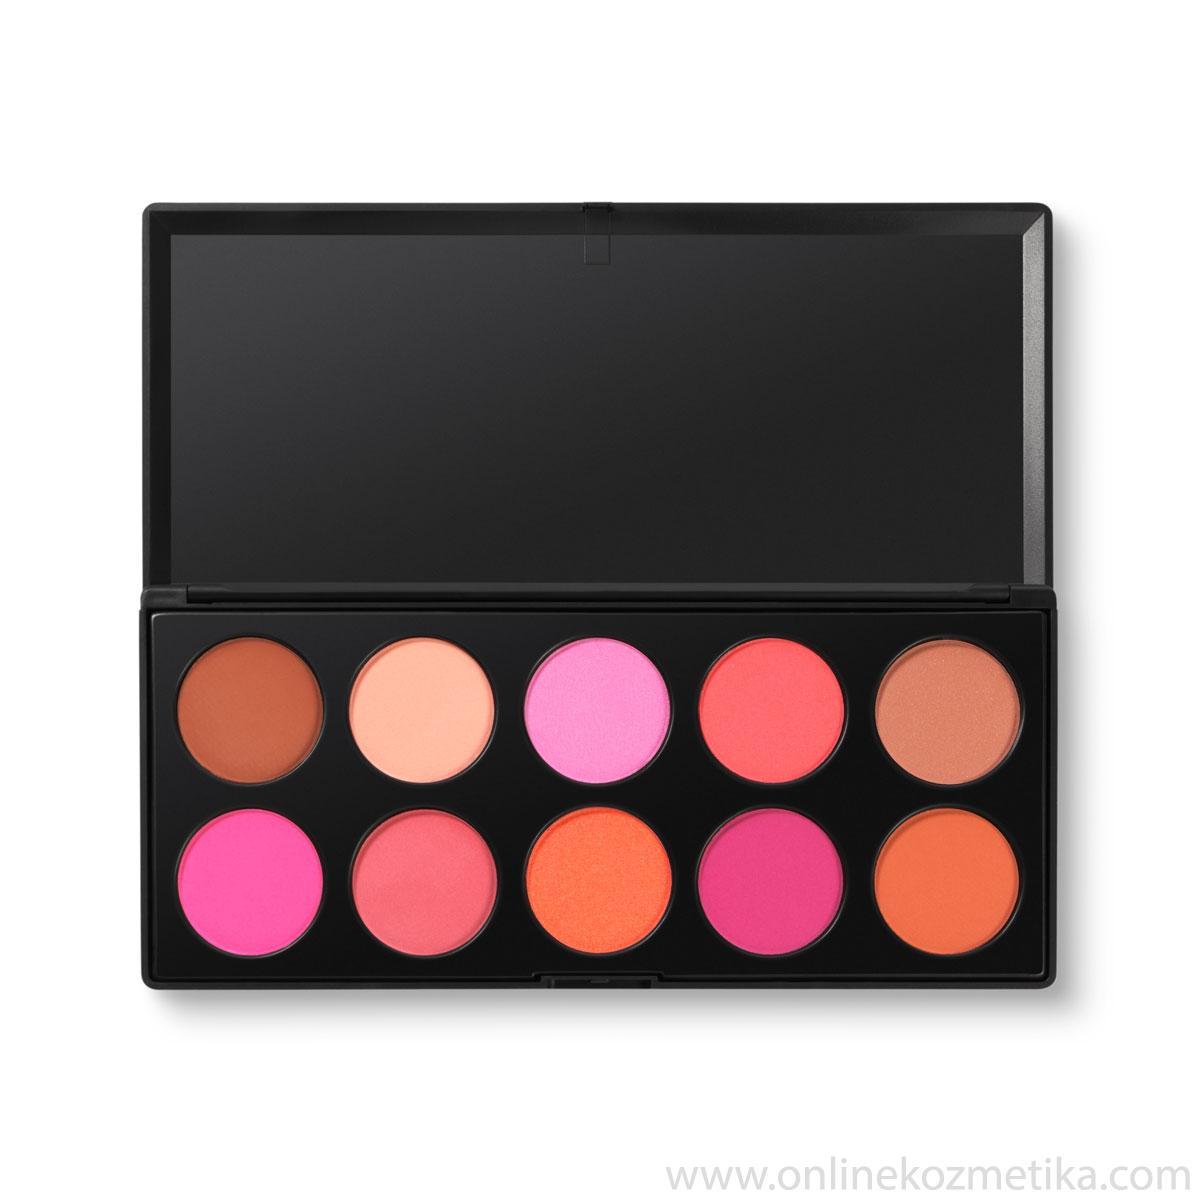 BH 6100-002 Professional Blush set 1/10